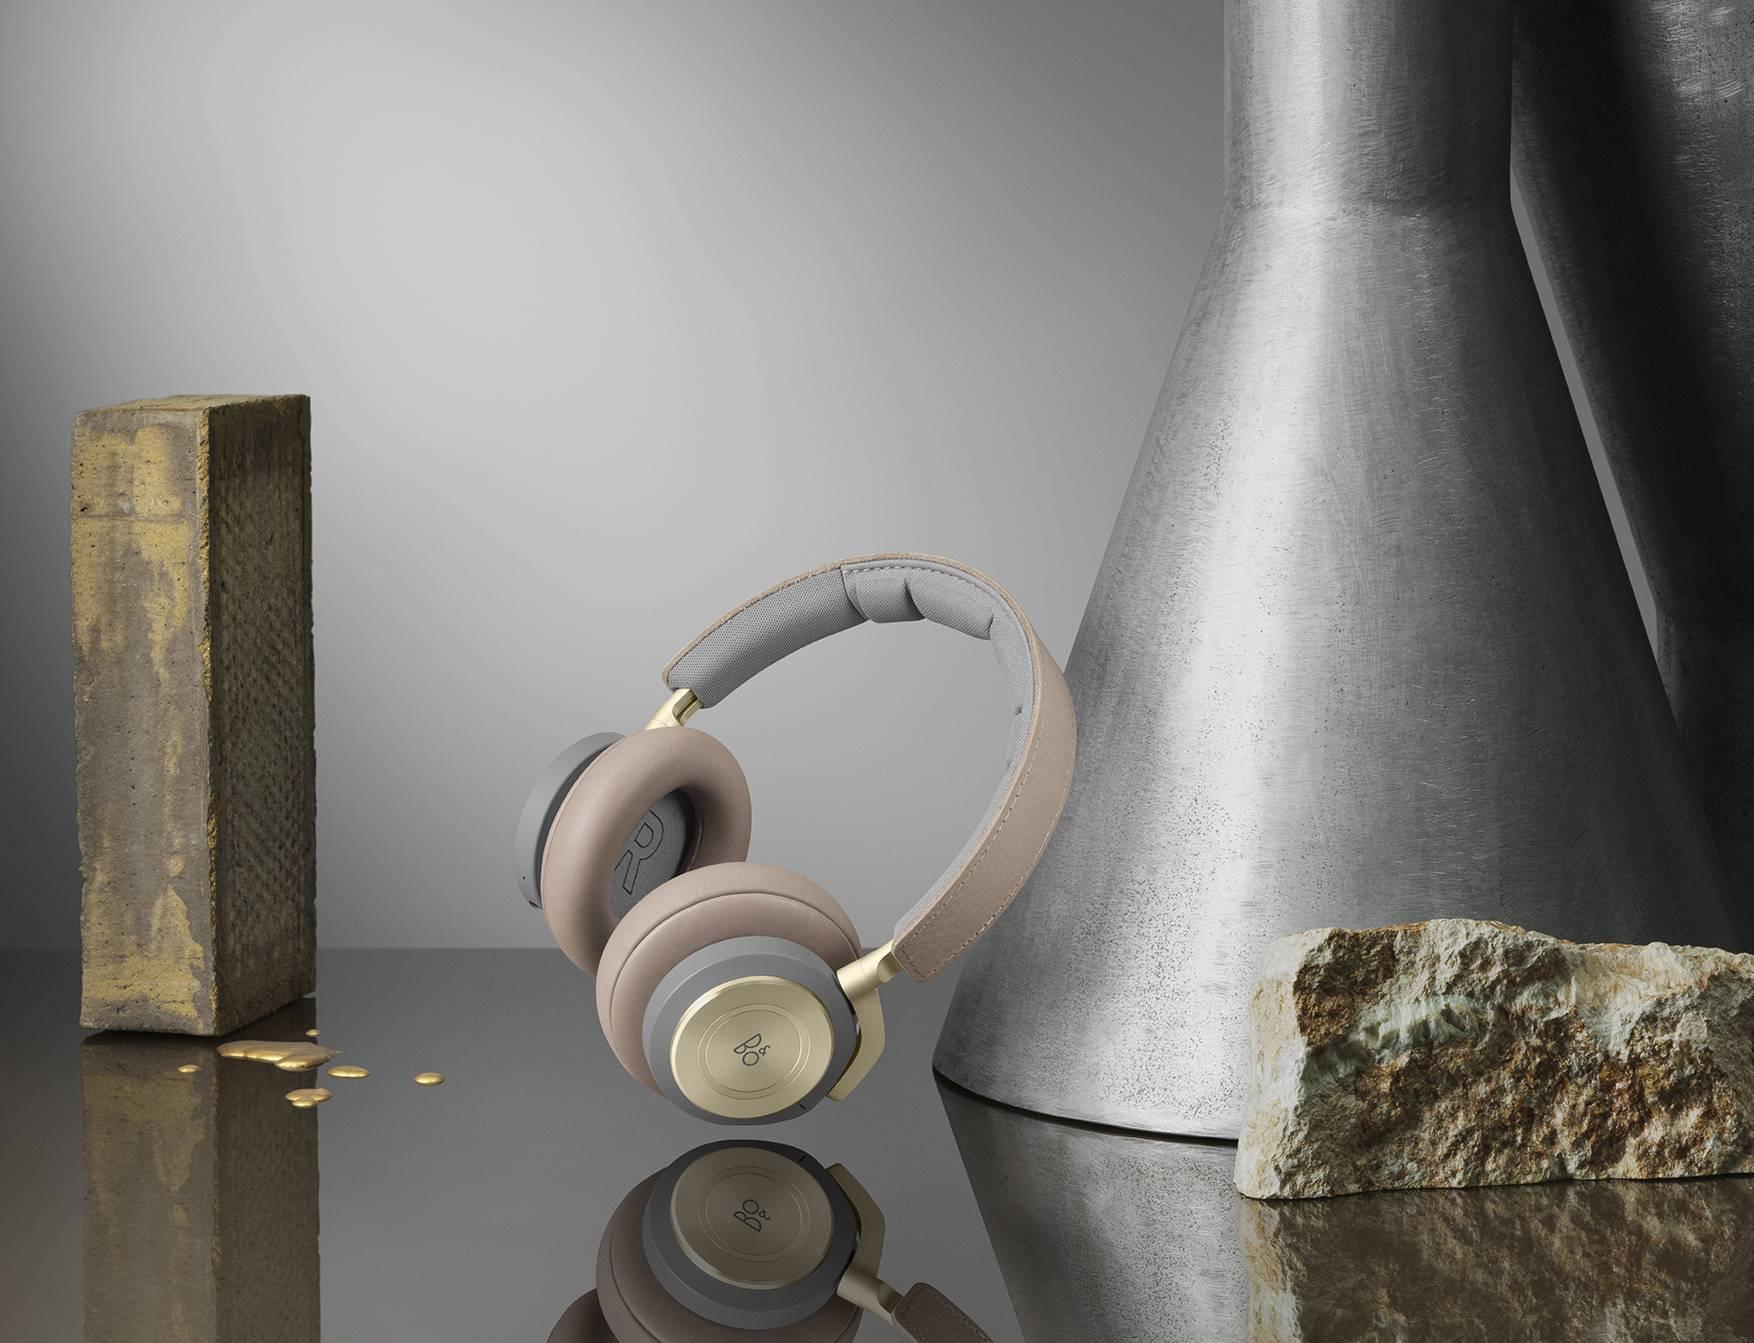 Statement Noise cancelling hoofdtelefoon-1